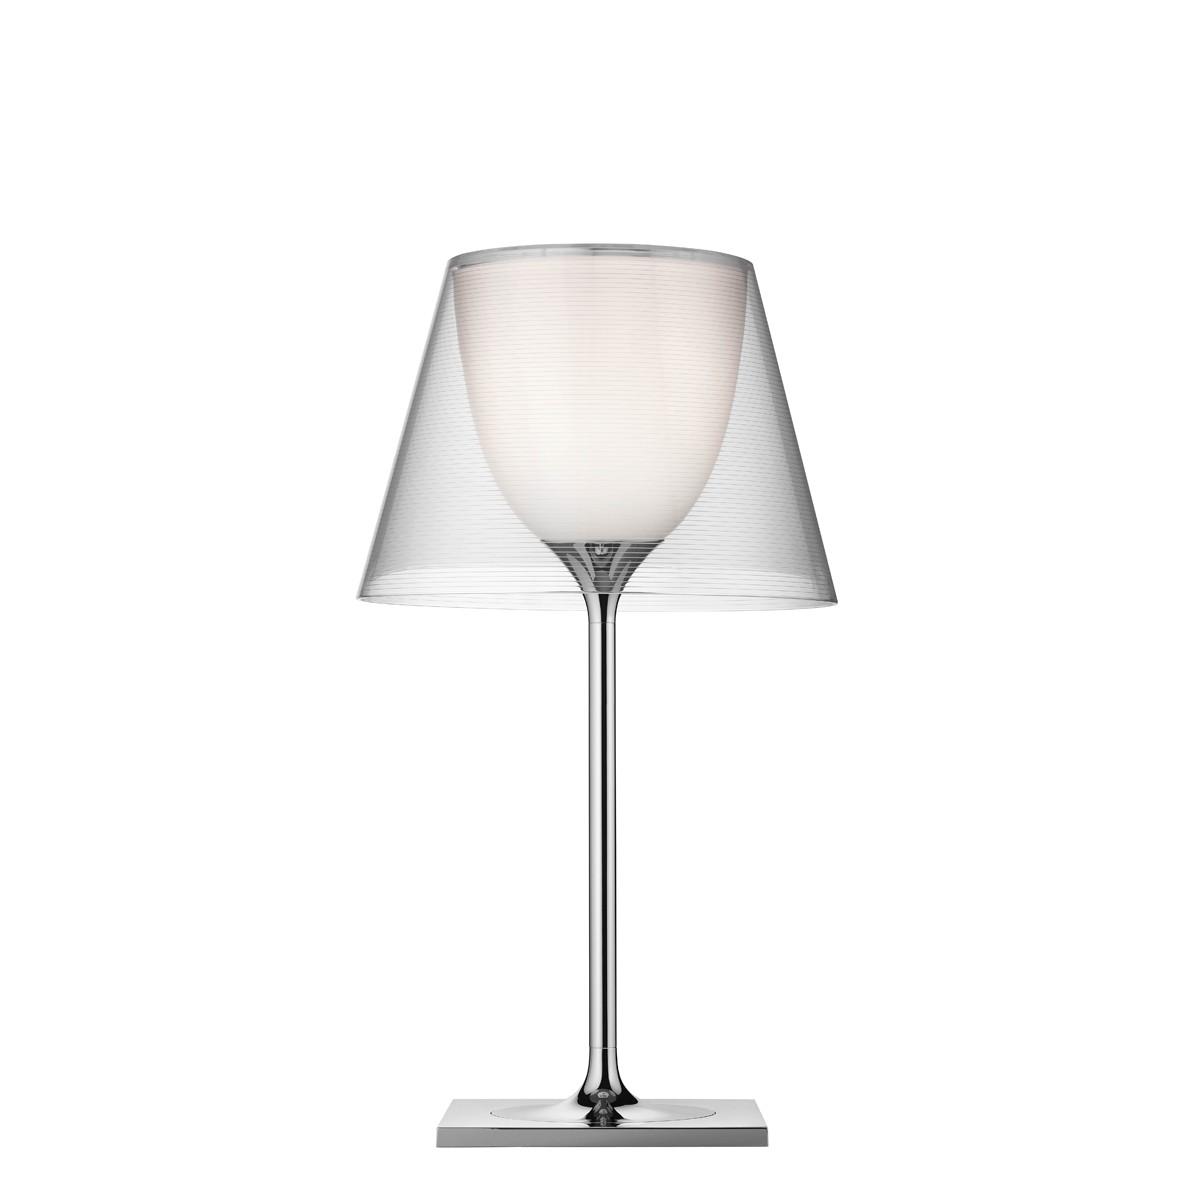 Flos KTribe T1 Tischleuchte, Kunststoff transparent